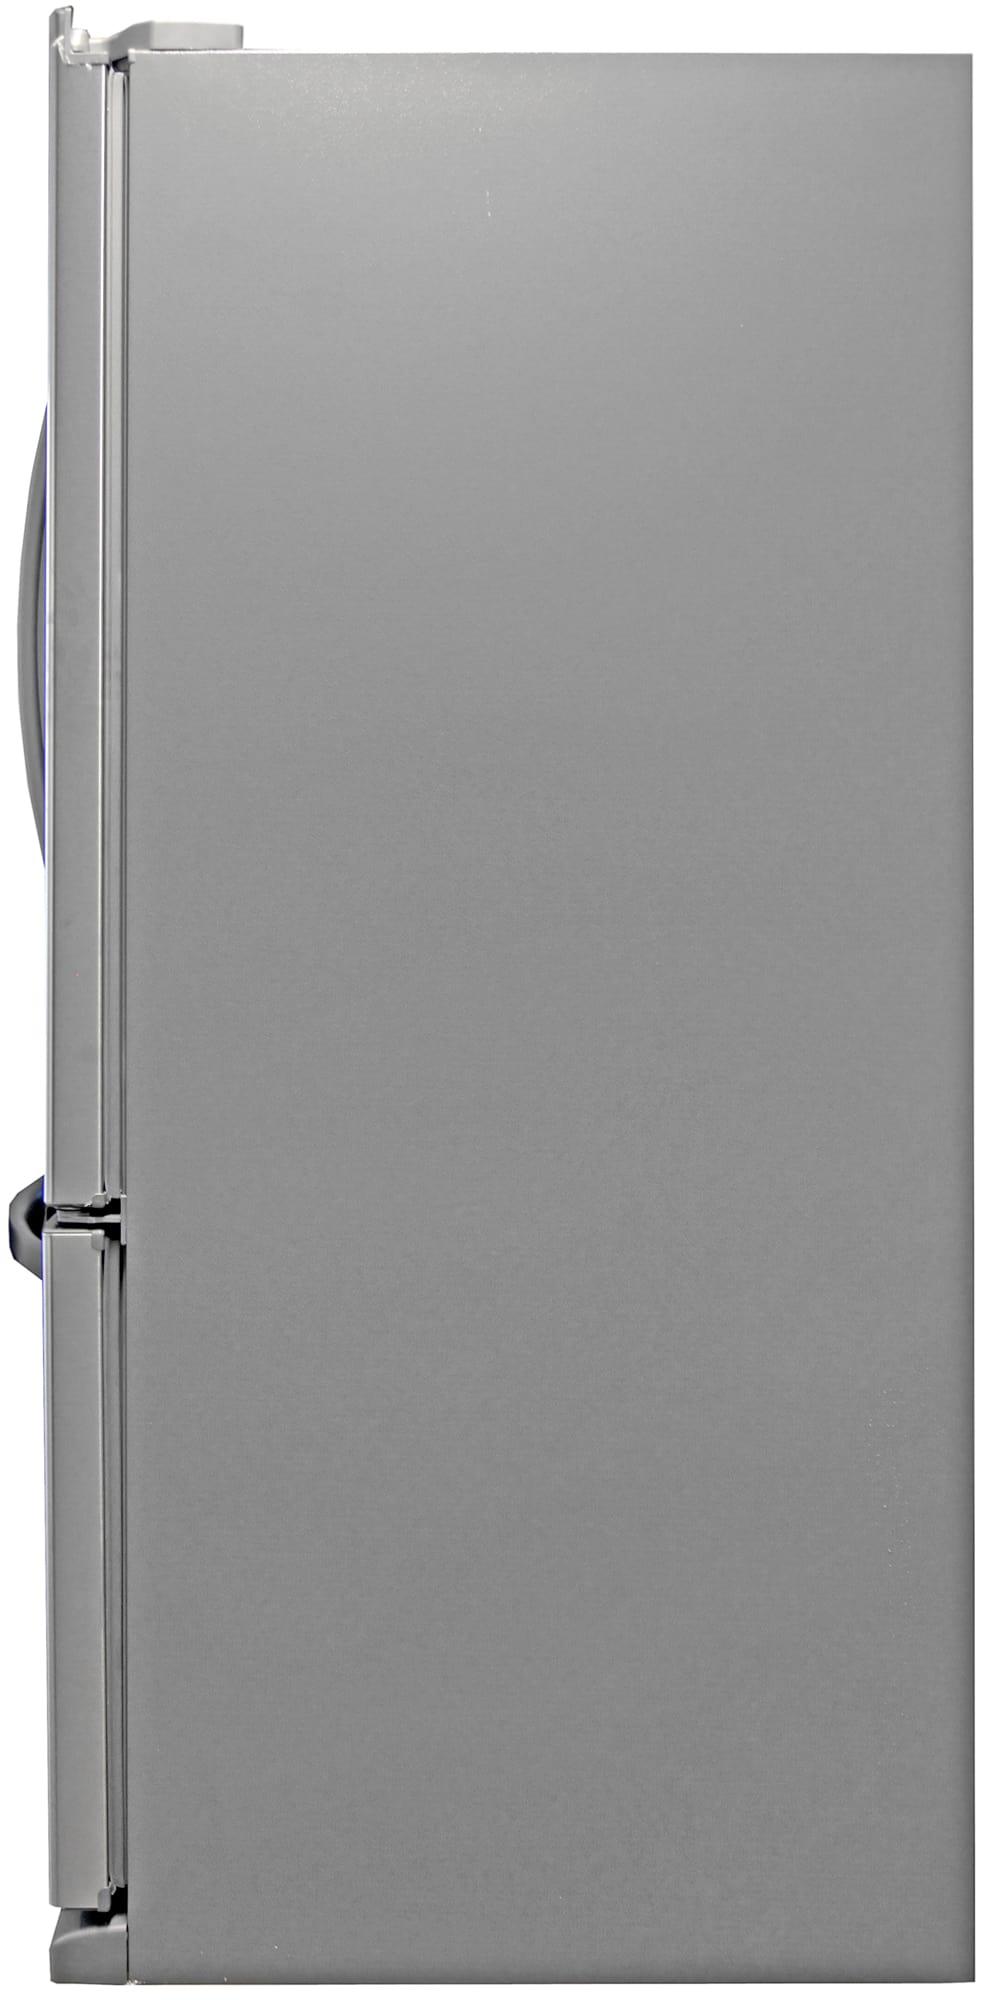 Grey matte sides are standard for fridges like the Kenmore 72013.